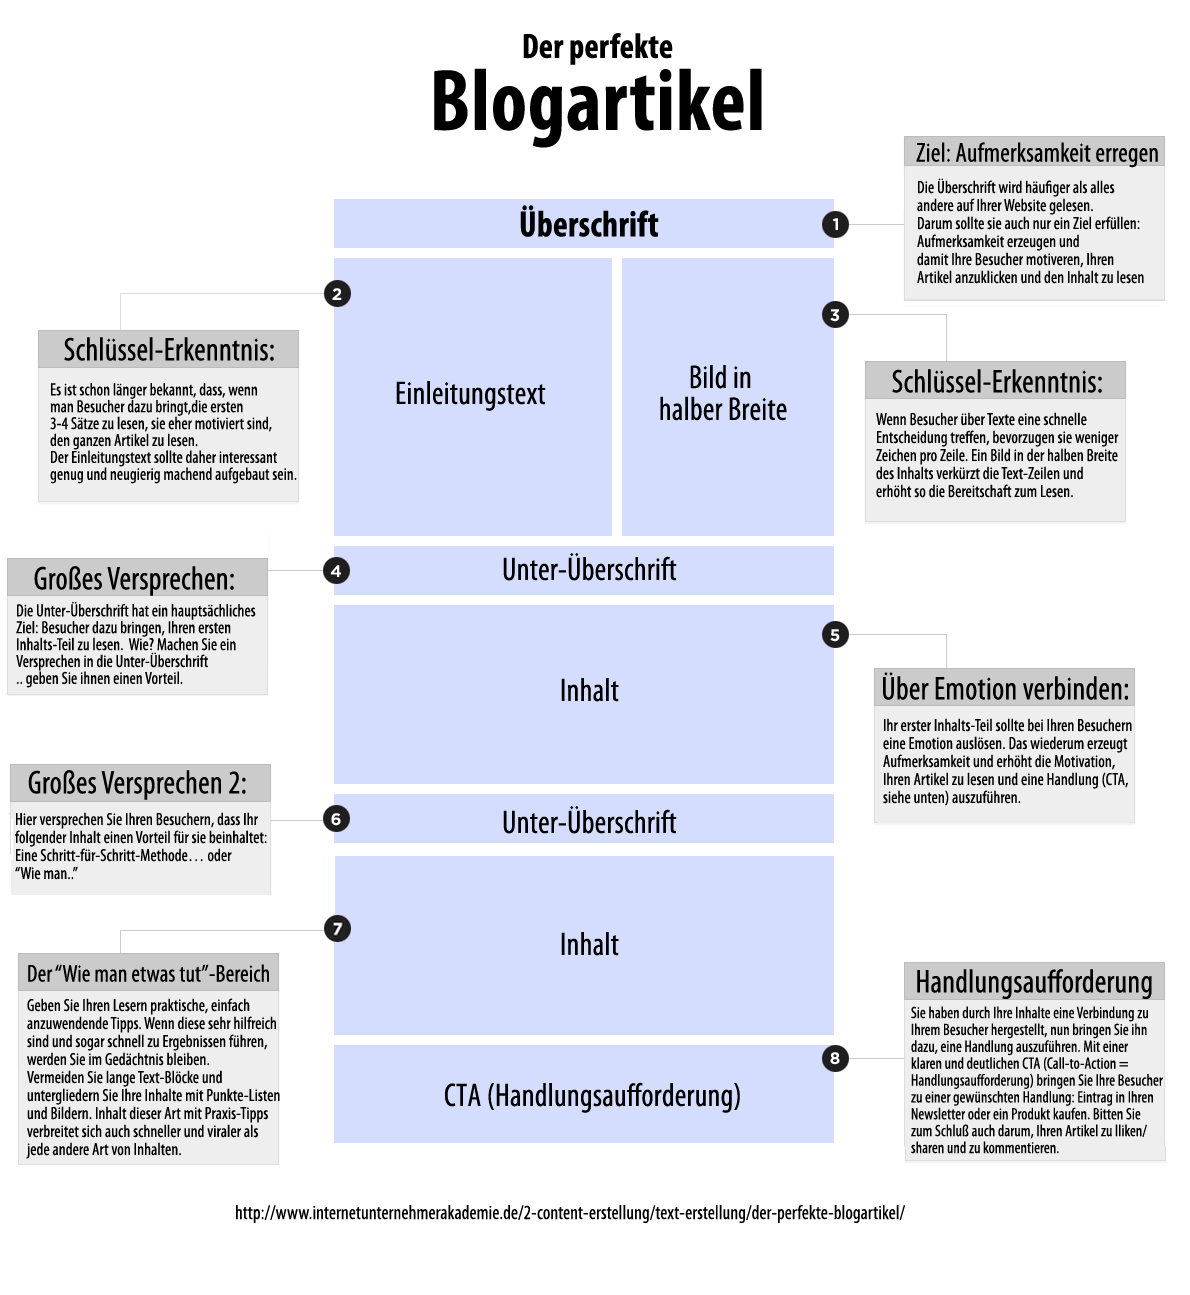 perfekter-blogartikel-anatomy